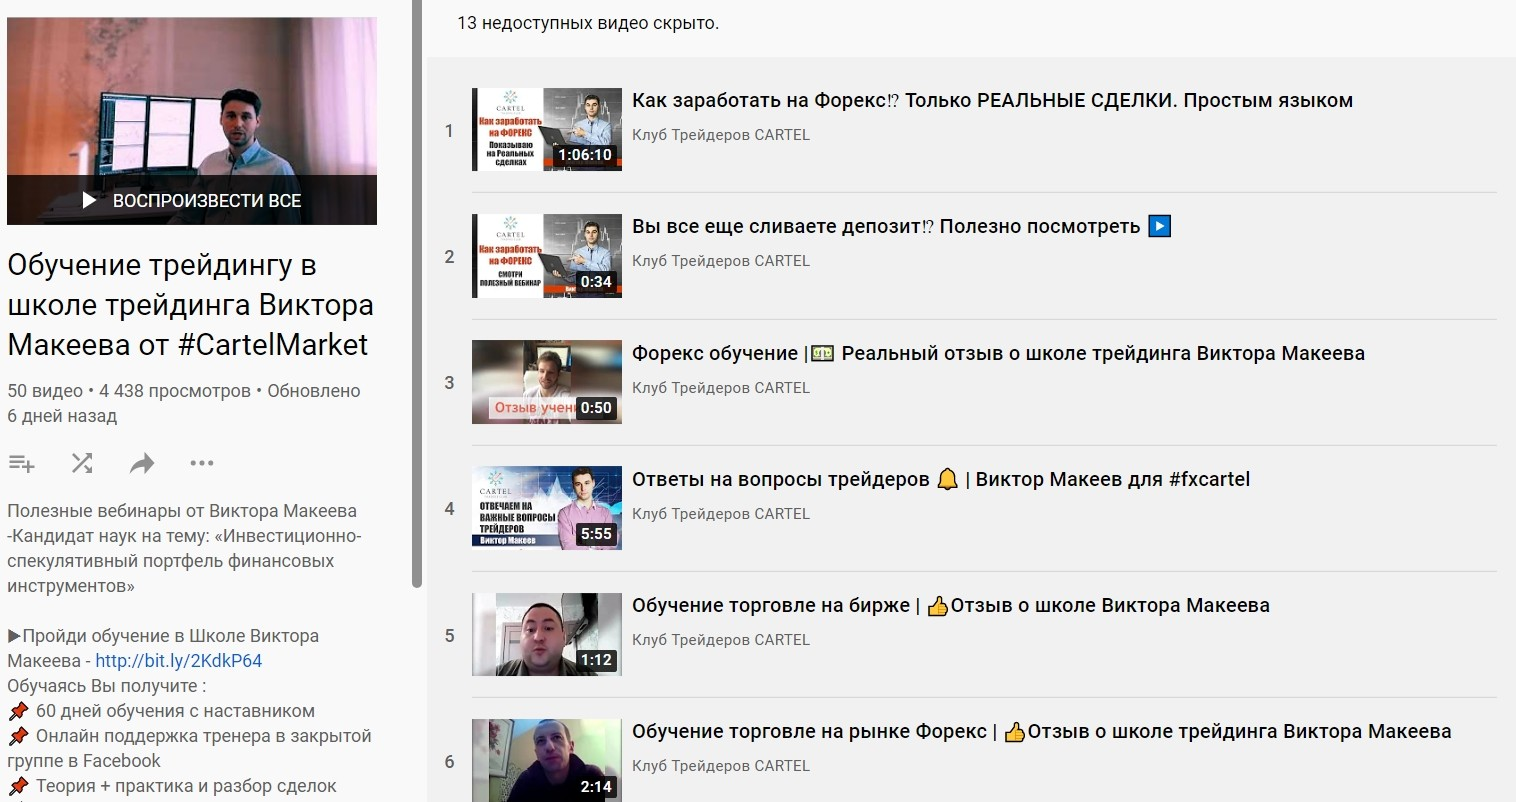 Ютуб канал Виктора Макеева